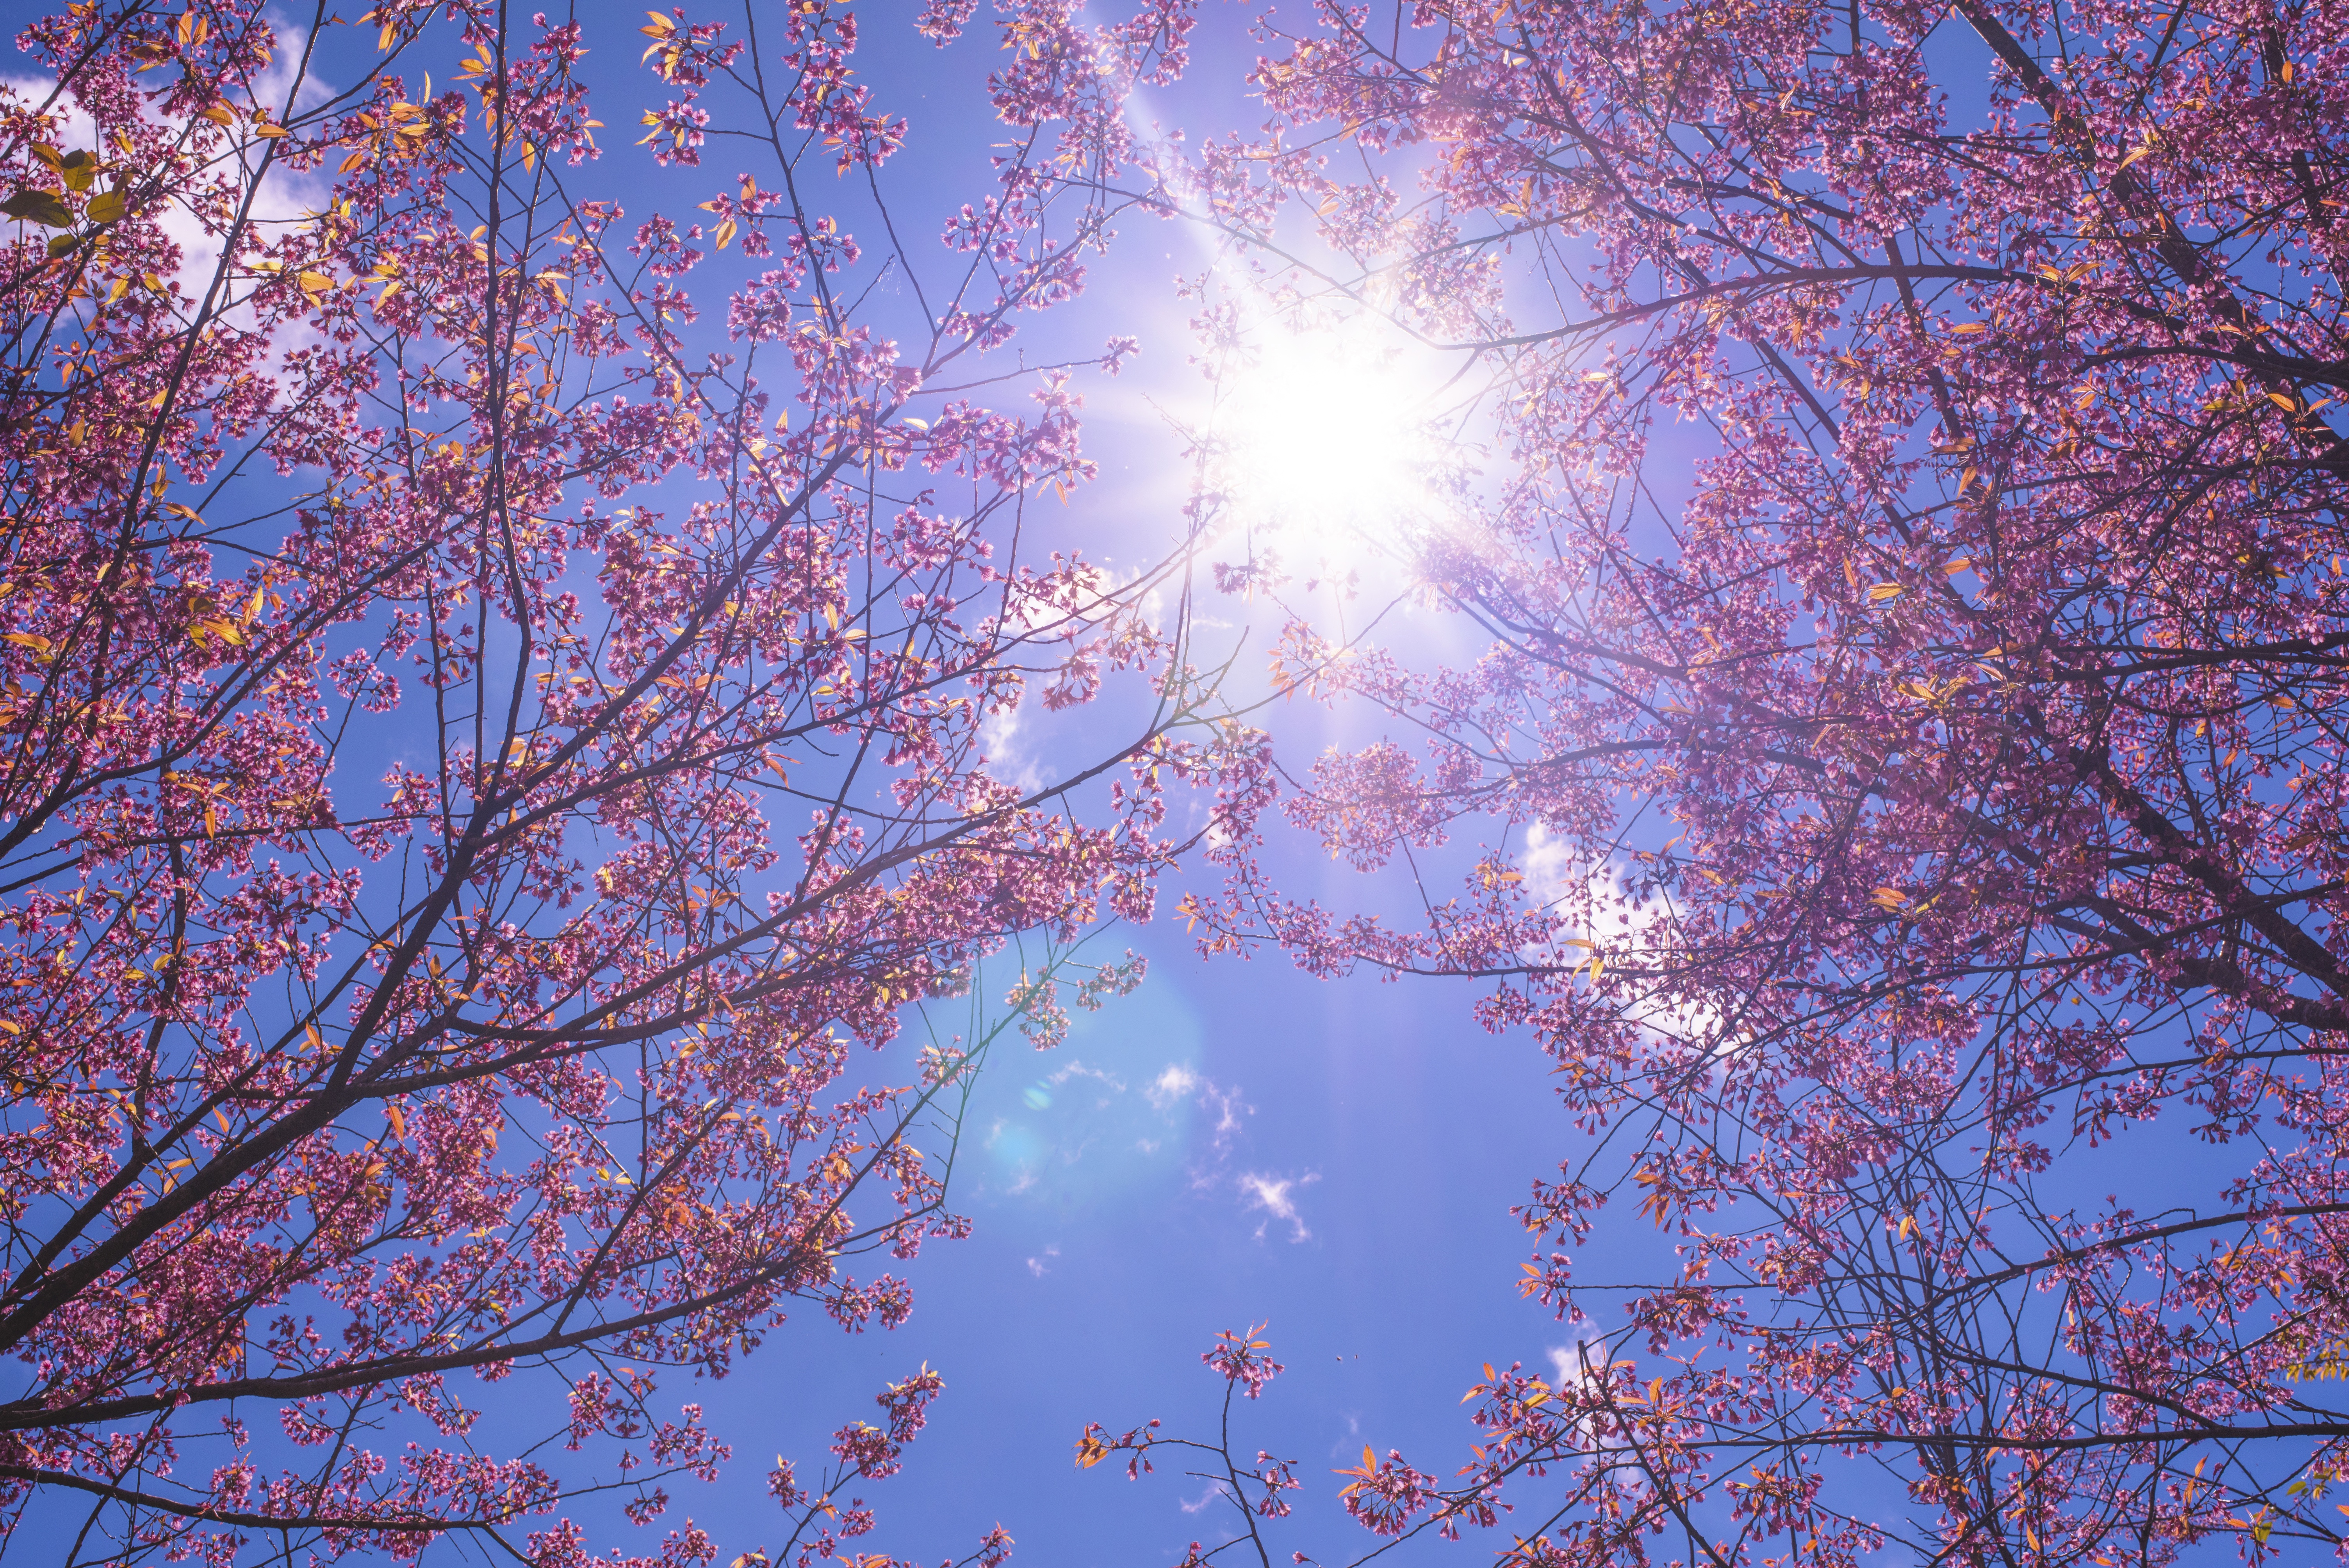 картинки красивое весеннее небо девушка стоит босыми